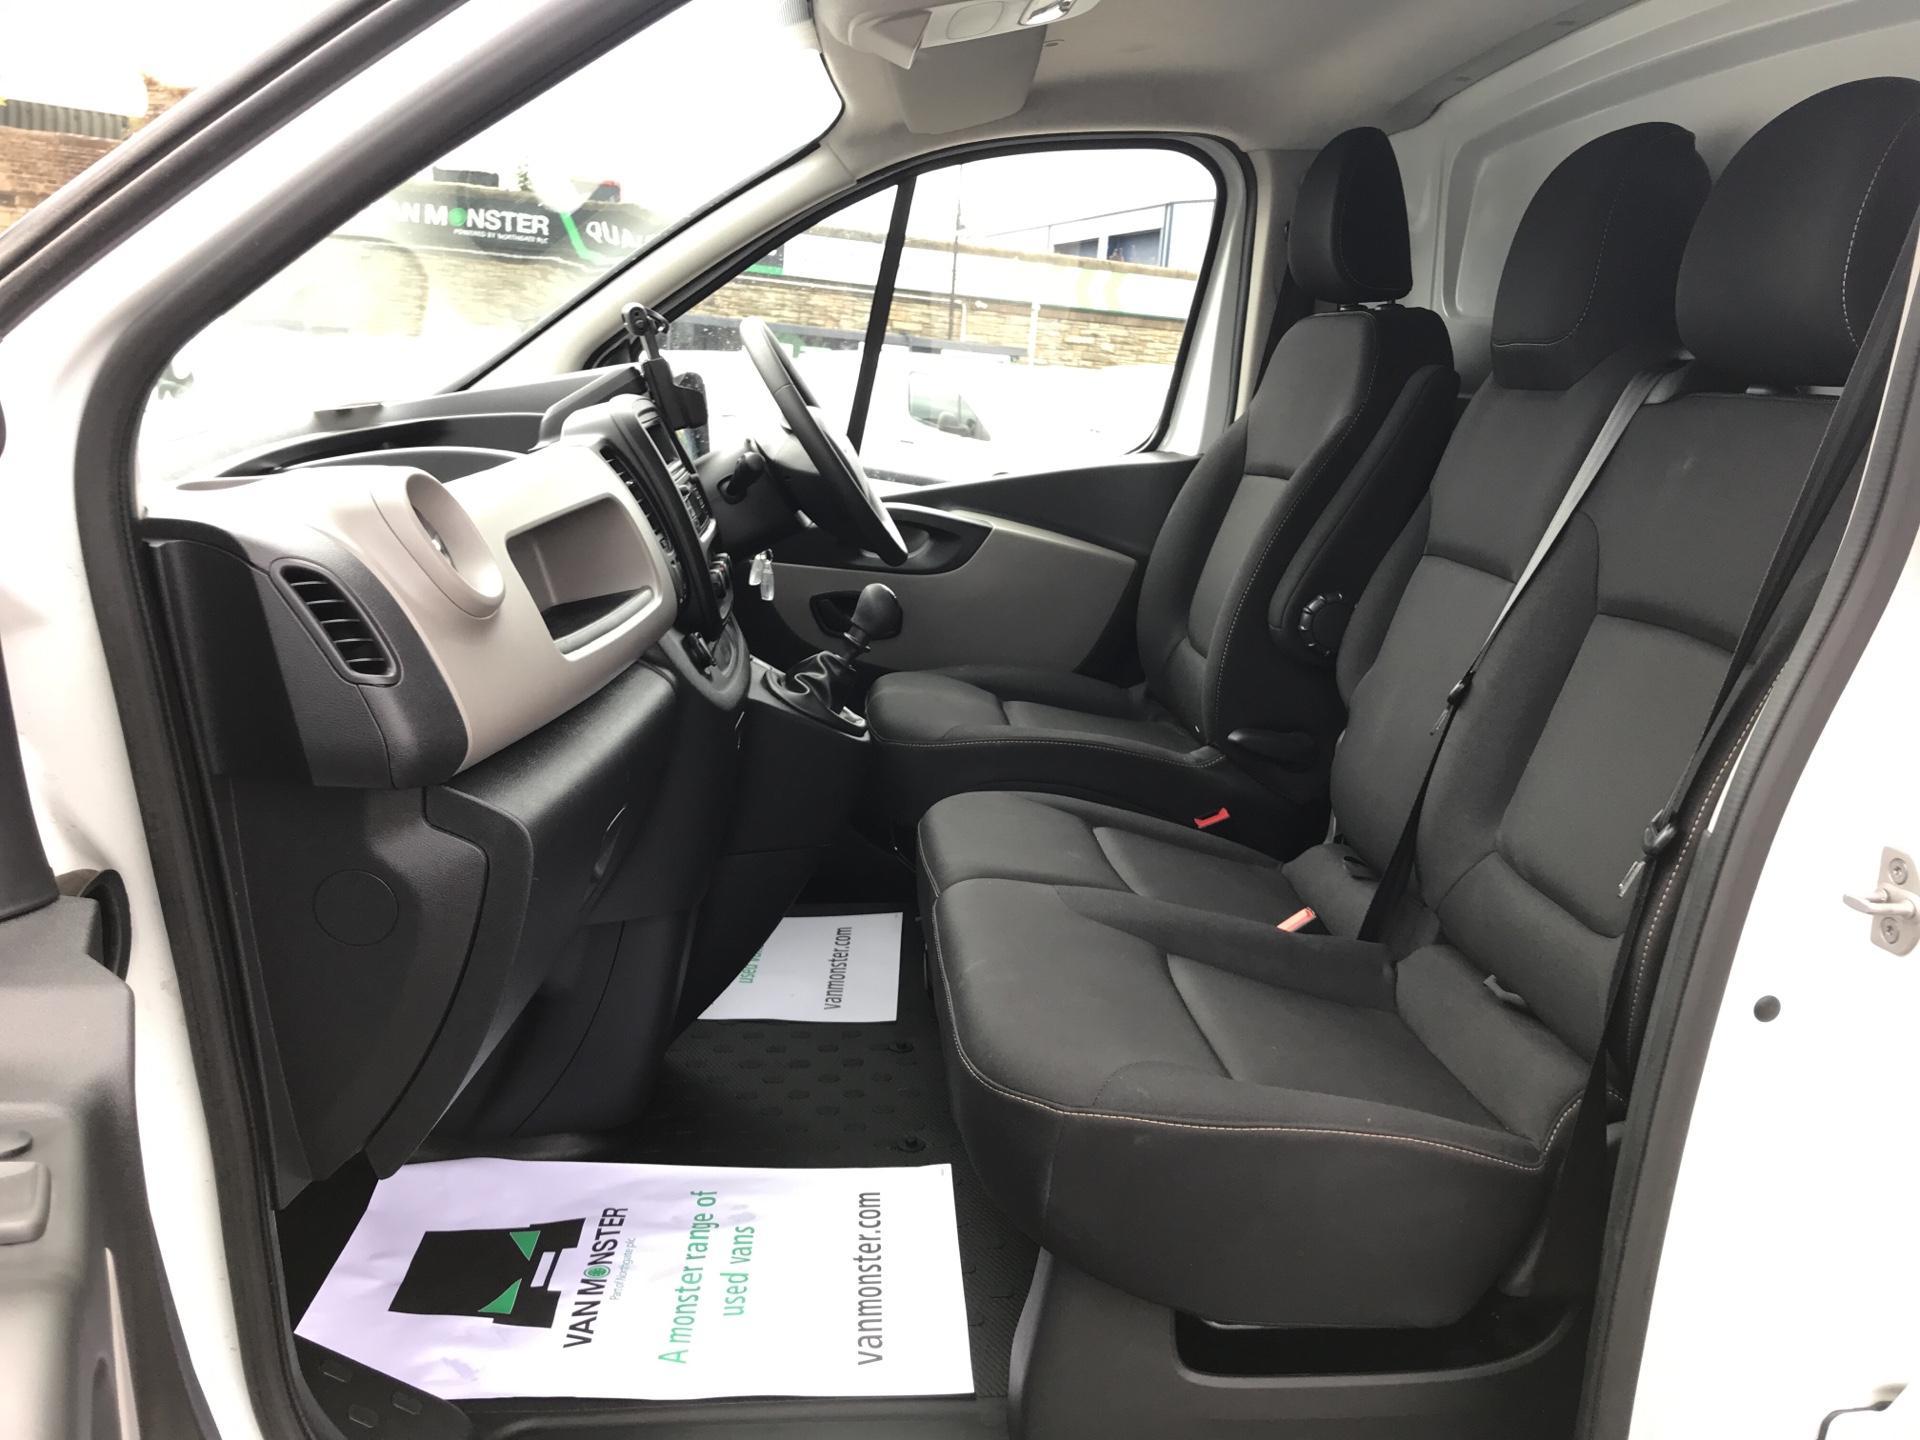 2017 Renault Trafic SL27dCi 120 BUSINESS+ VAN EURO 6 (FY67ODU) Image 14